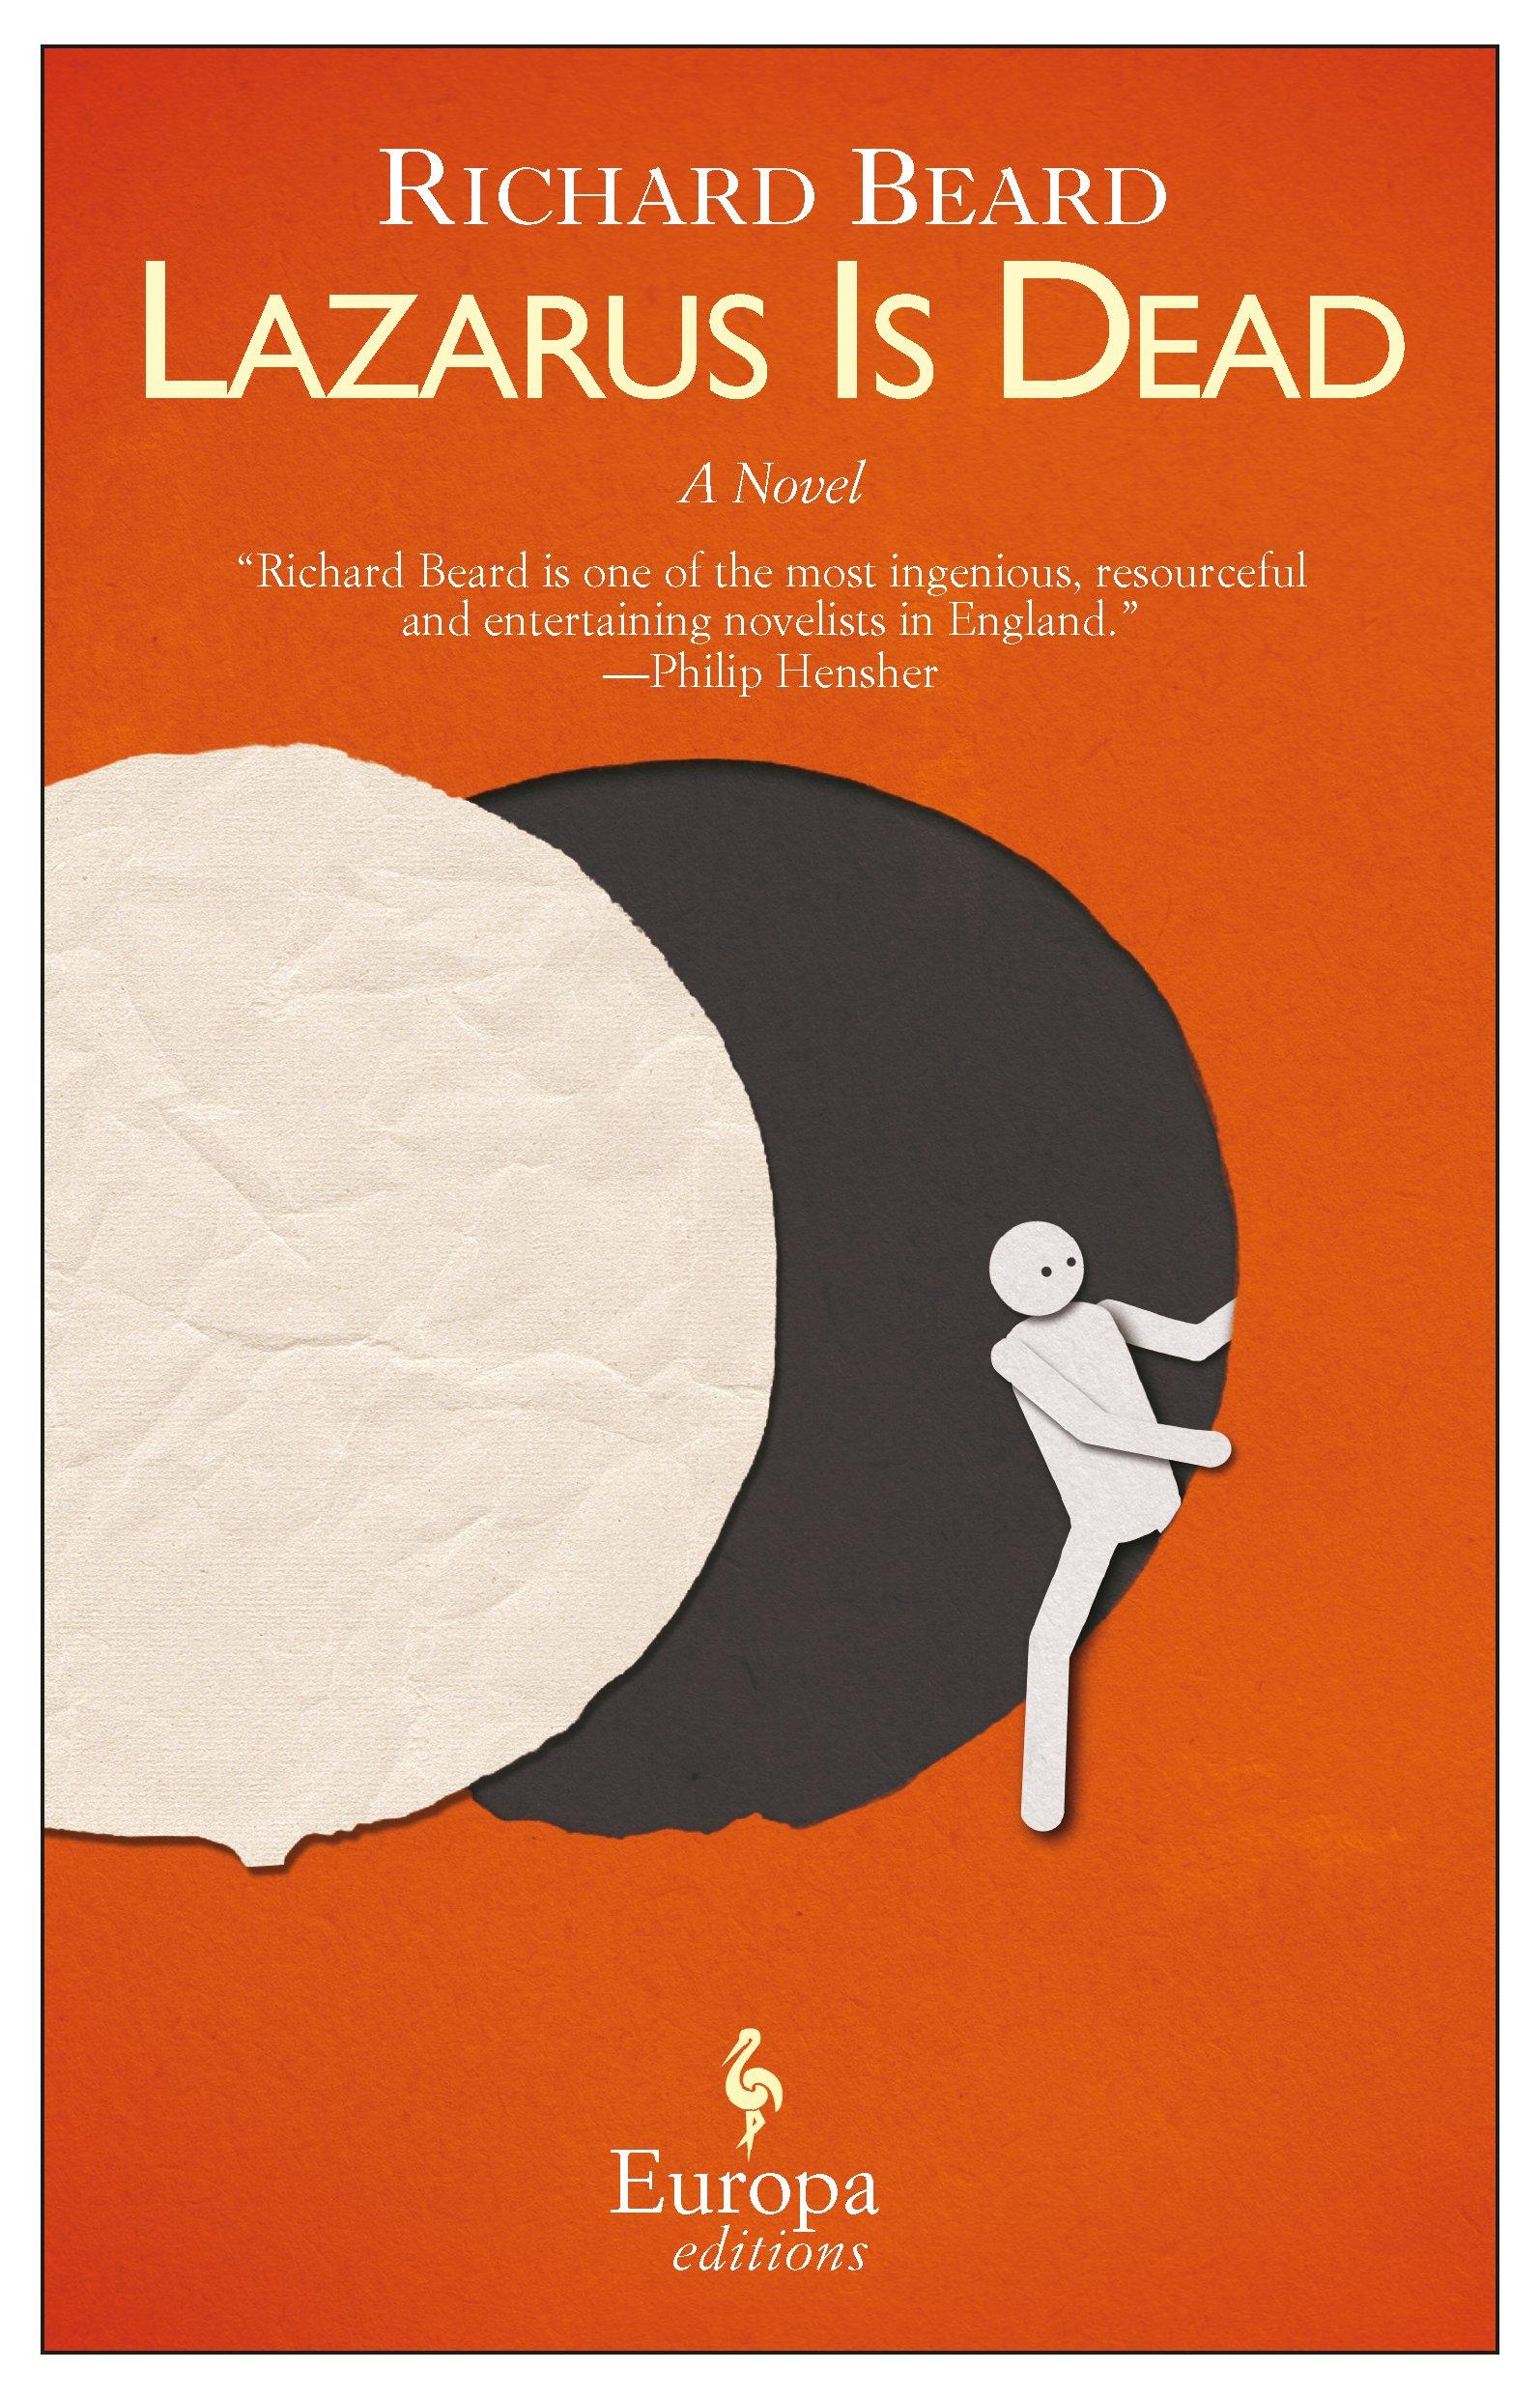 Lazarus is Dead: Richard Beard: 9781609450809: Amazon com: Books